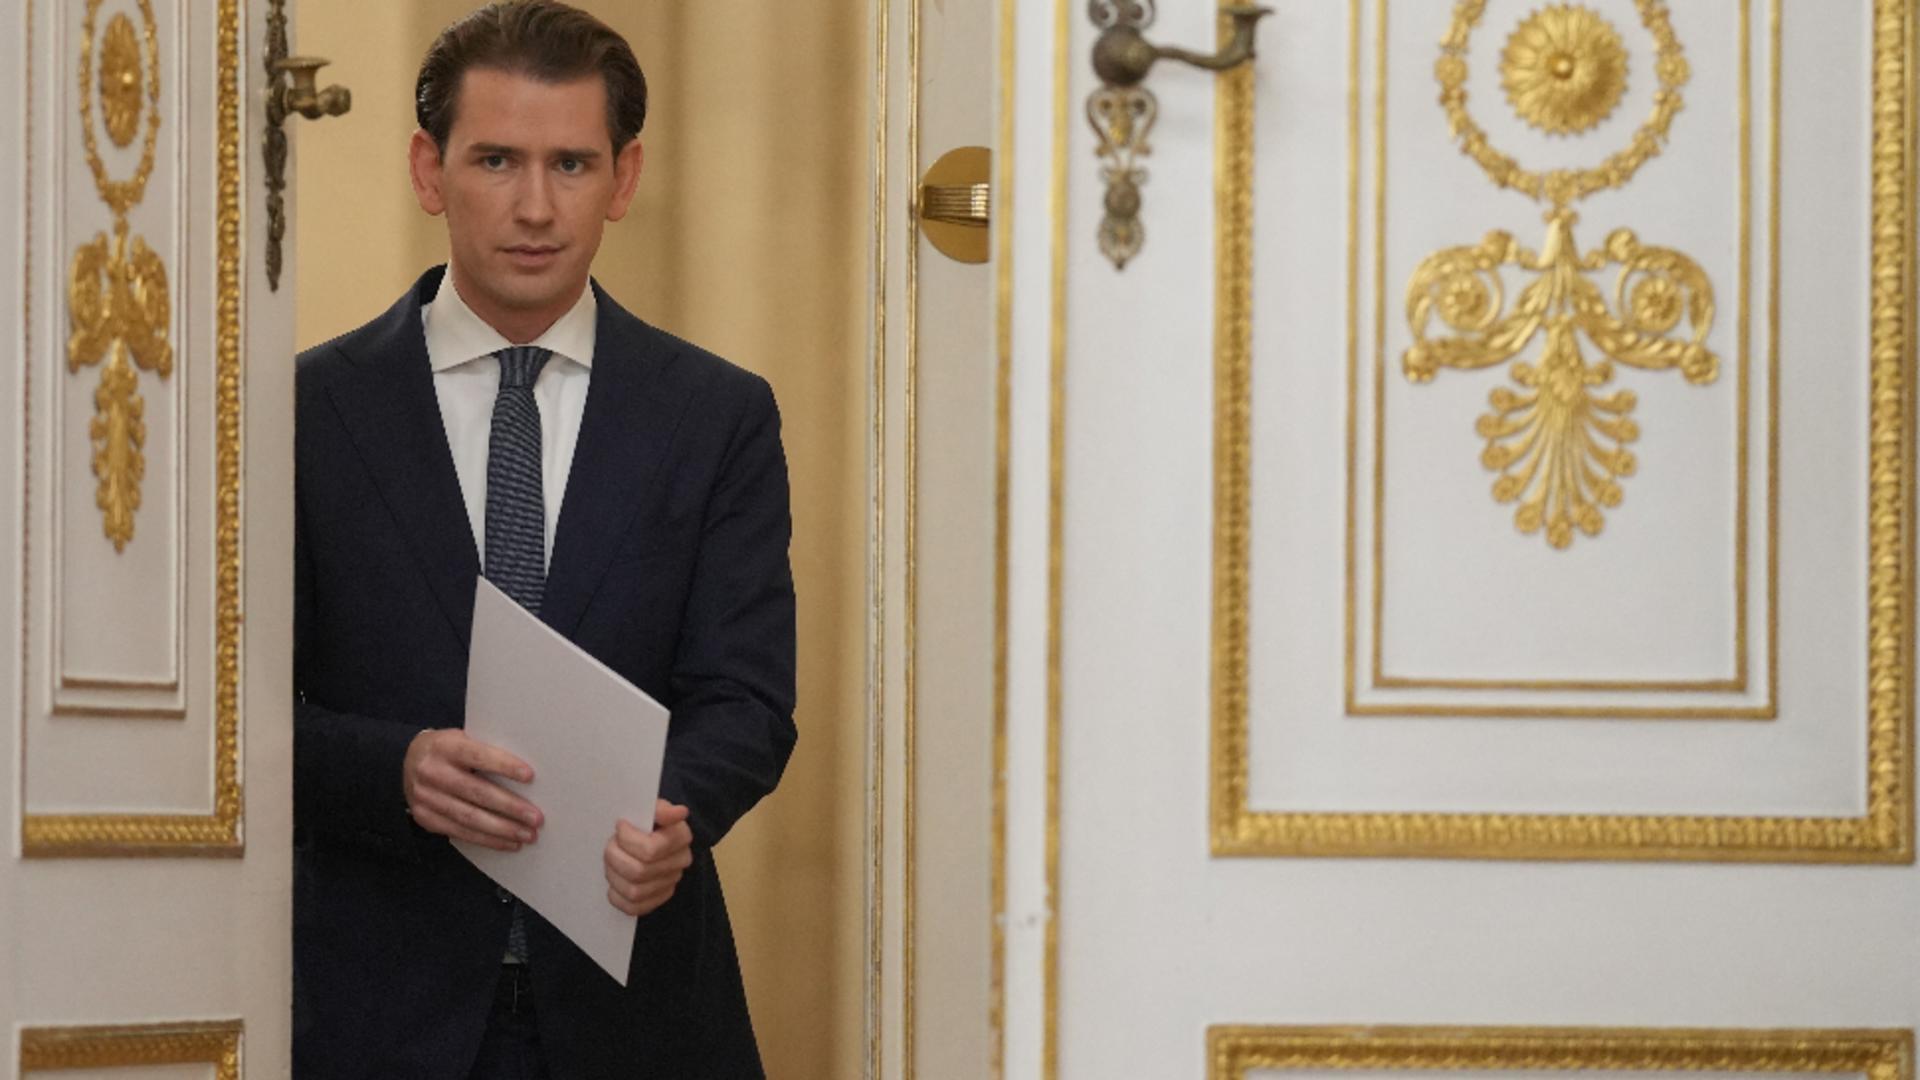 Cancelarul Austriei, Sebastian Kurz, și-a prezentat demisia. Foto/Profimedia